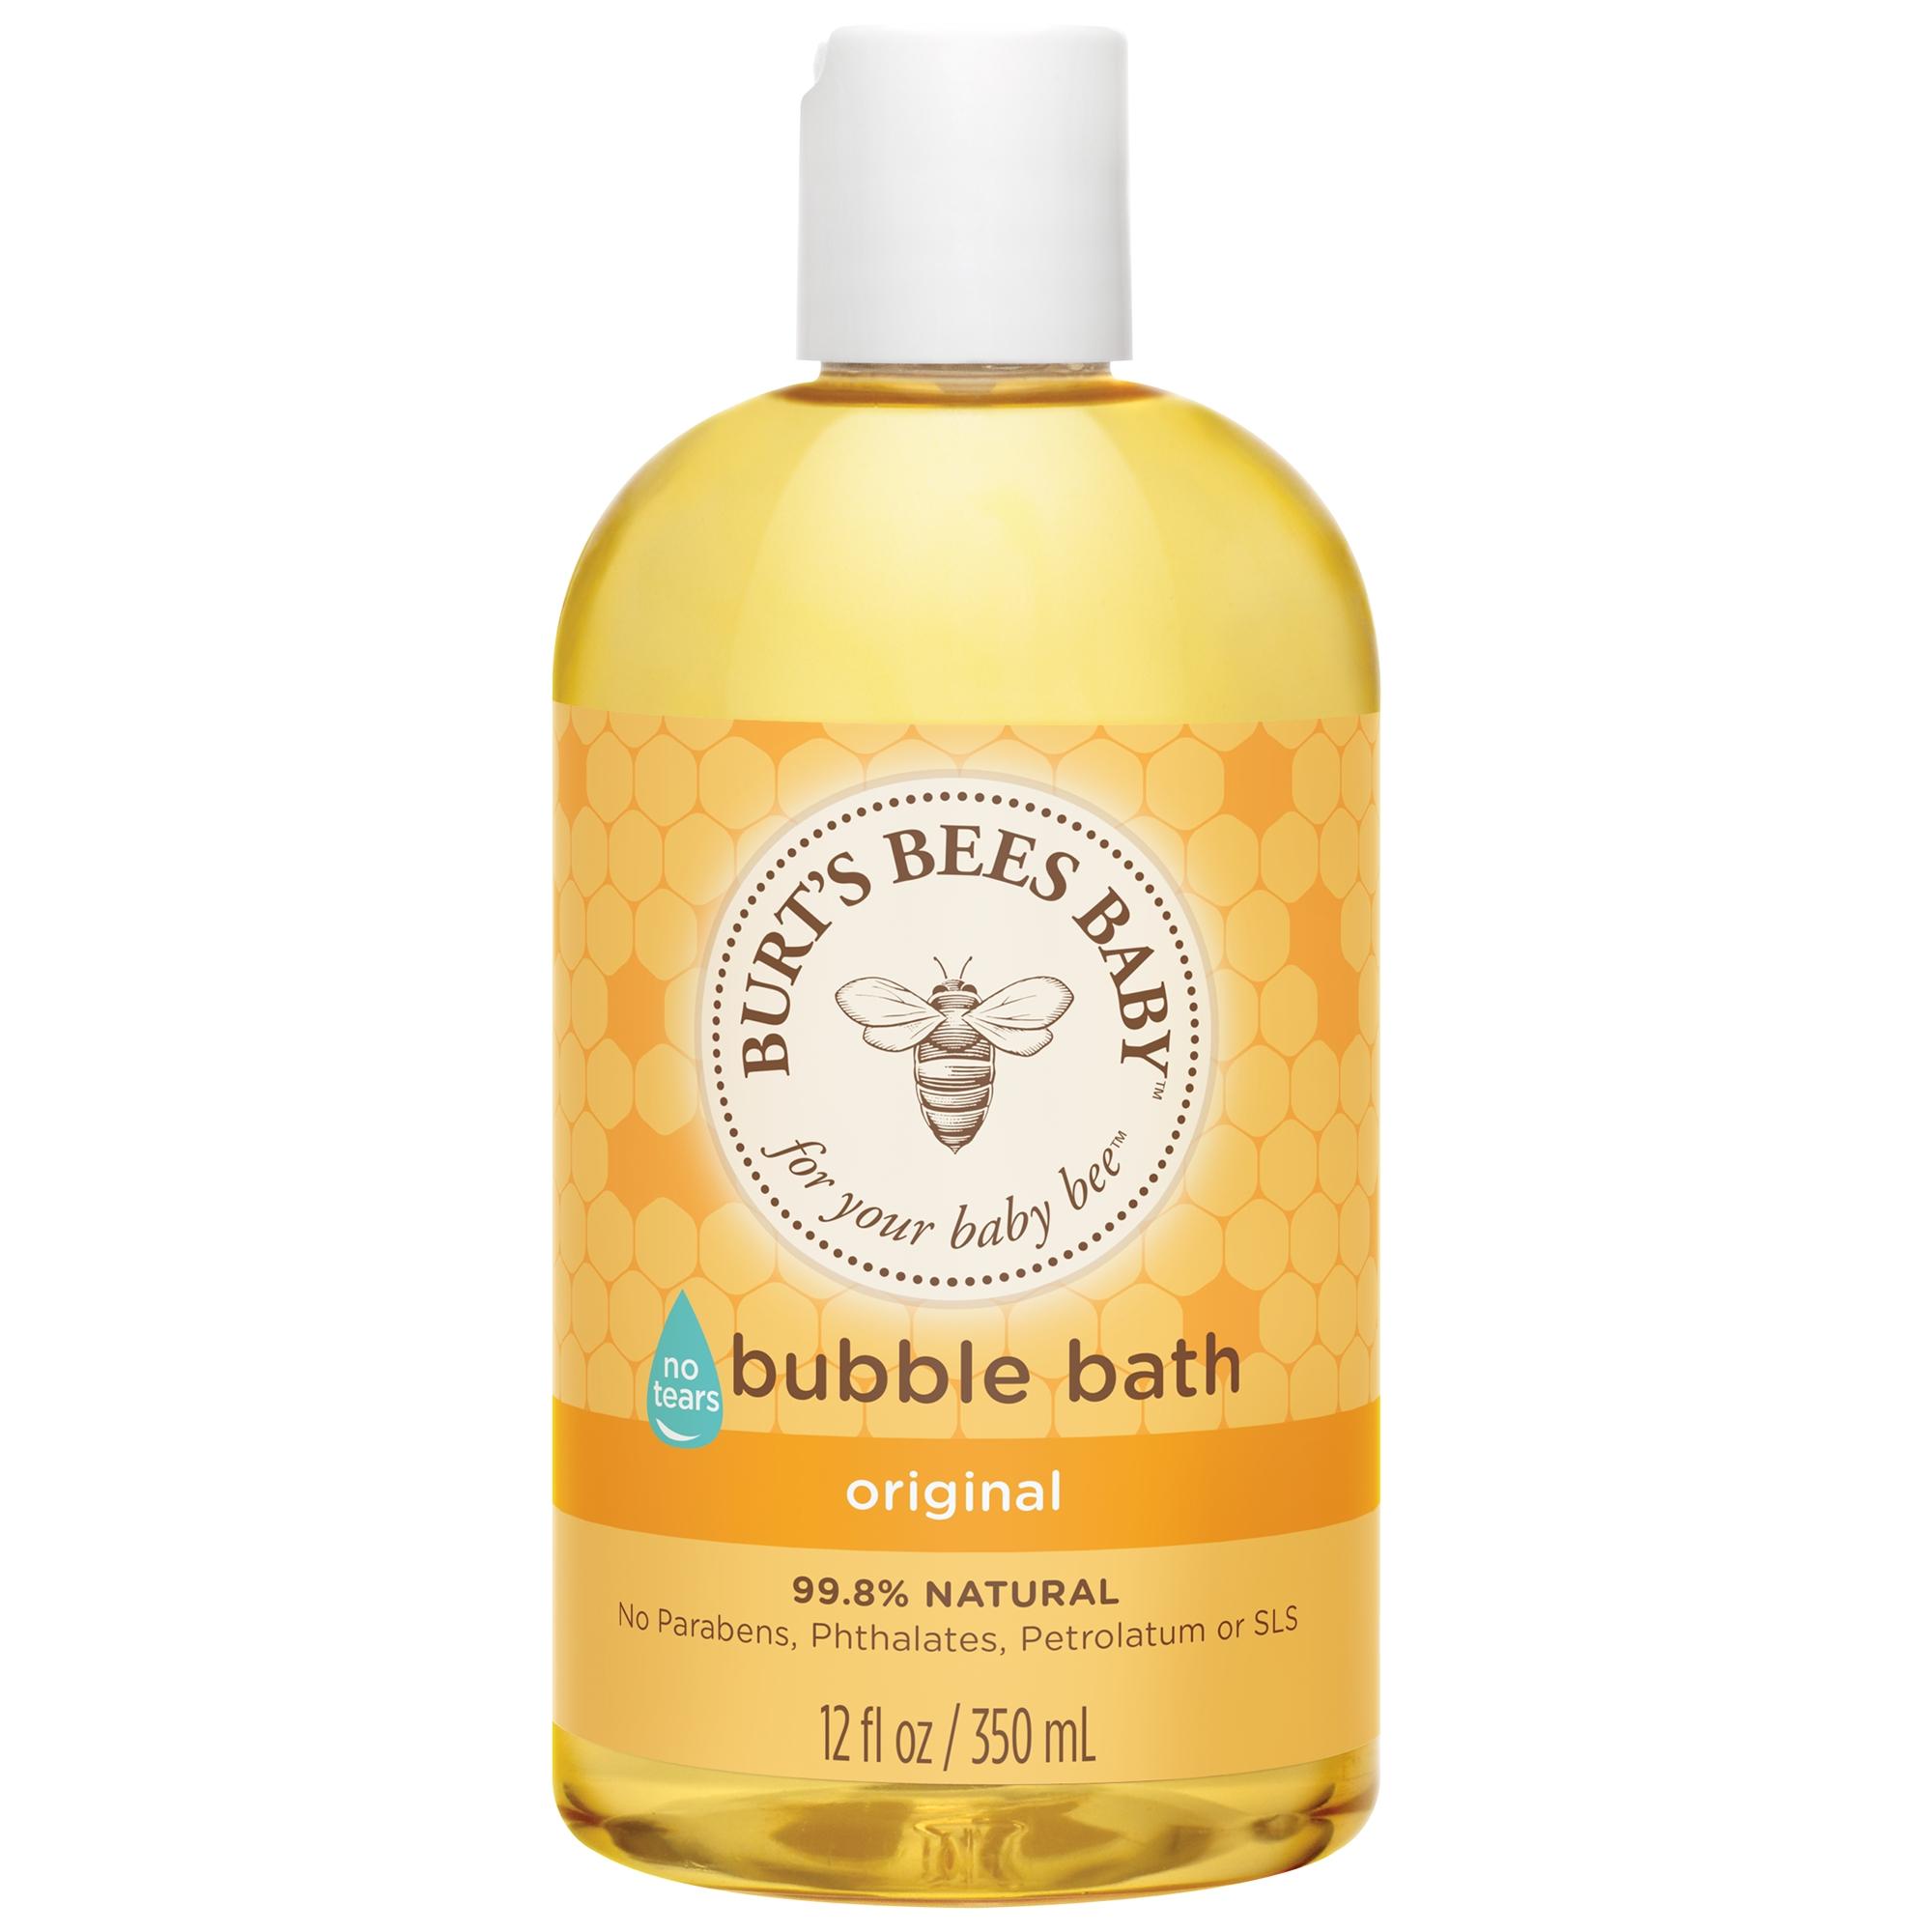 Burt's Bees Baby Bubble Bath, Tear Free Baby Wash - 12 oz Bottle